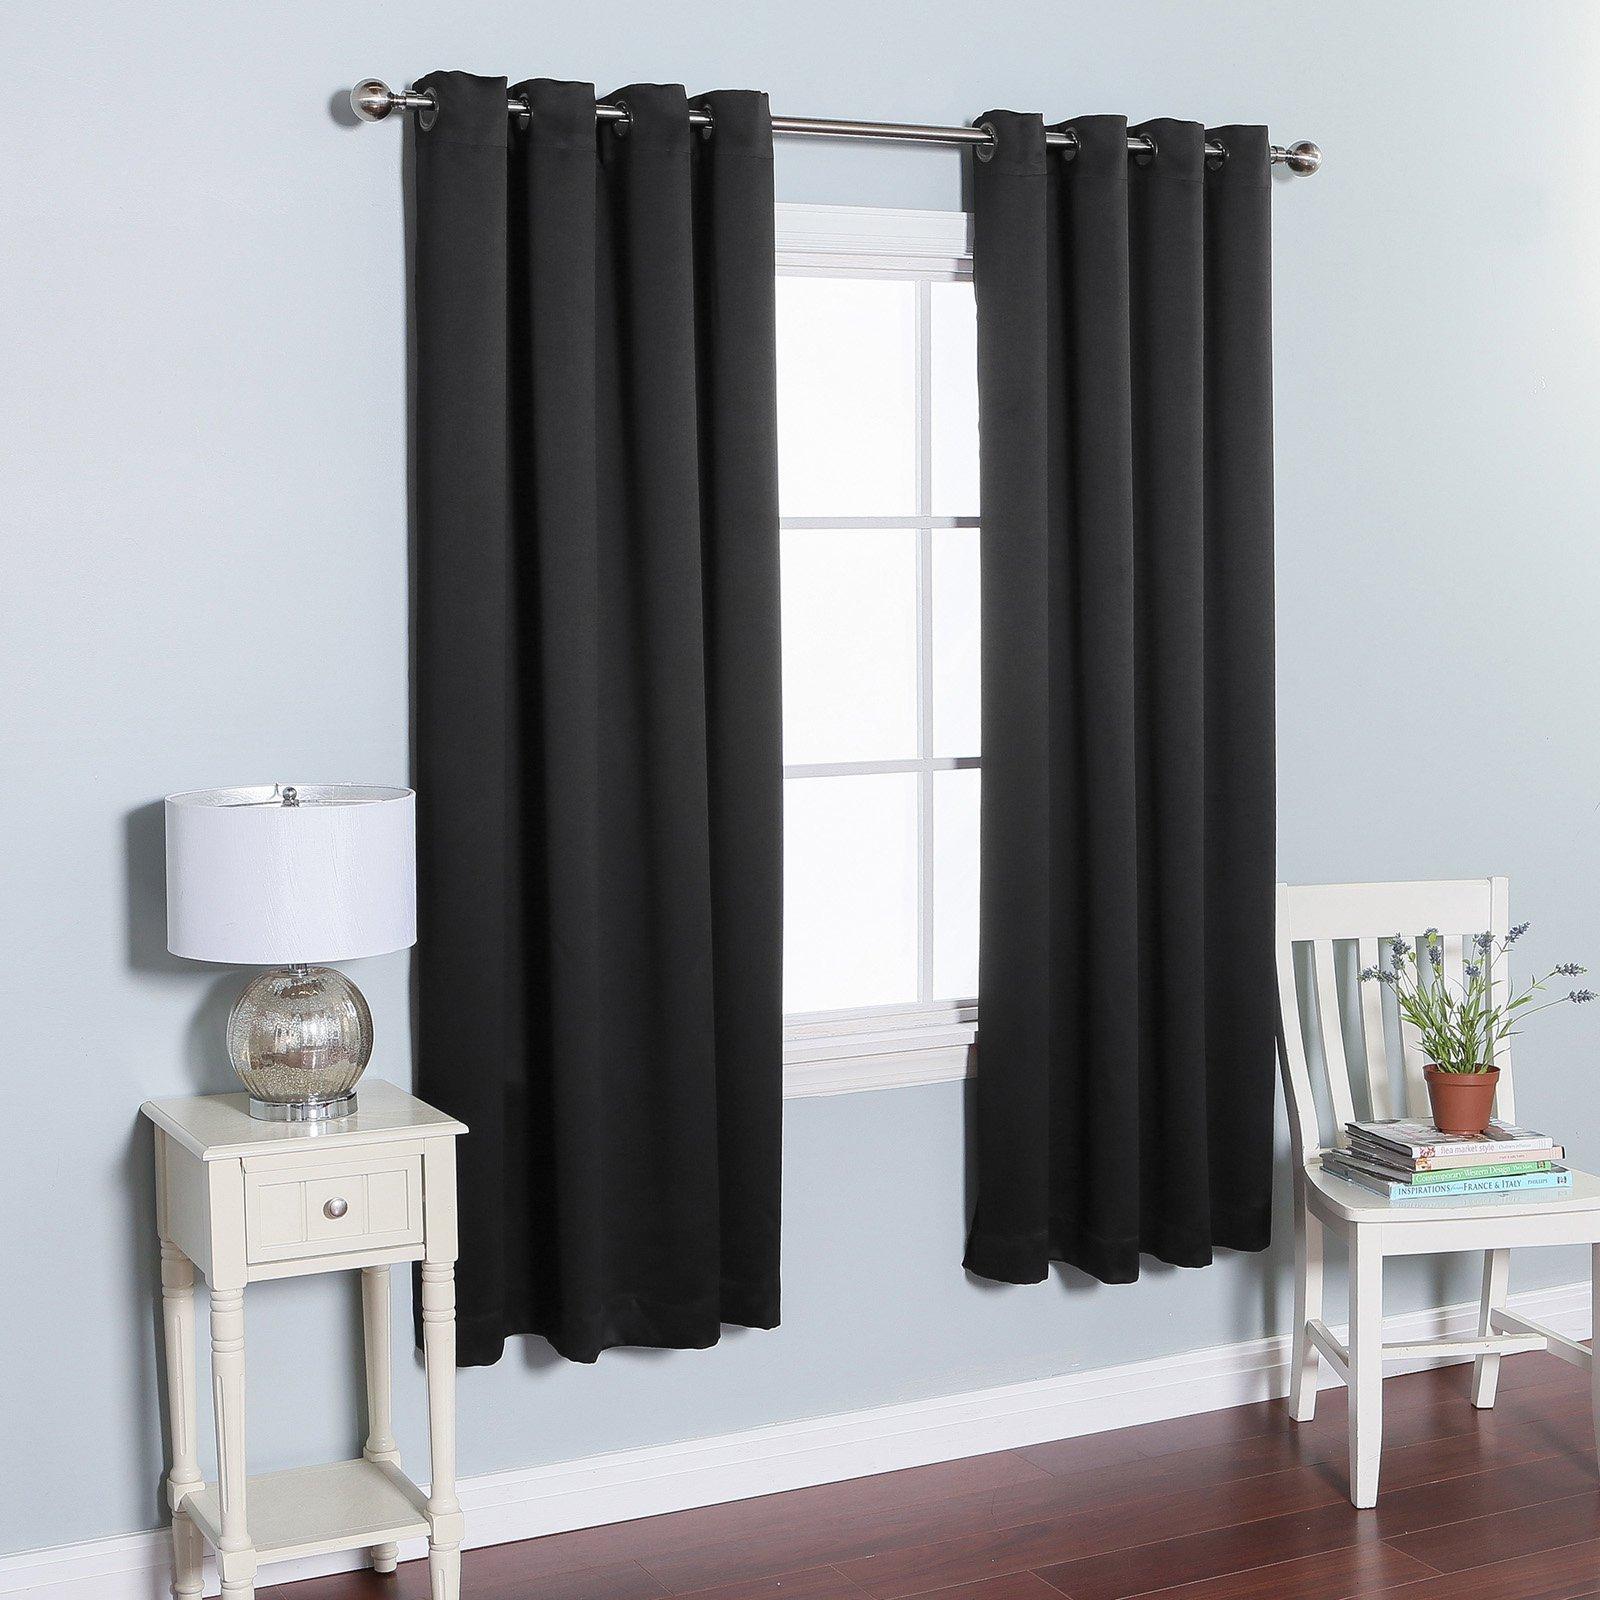 Blackout Drapes for Bedroom Unique Best Home Fashion thermal Grommet Blackout Curtain Black